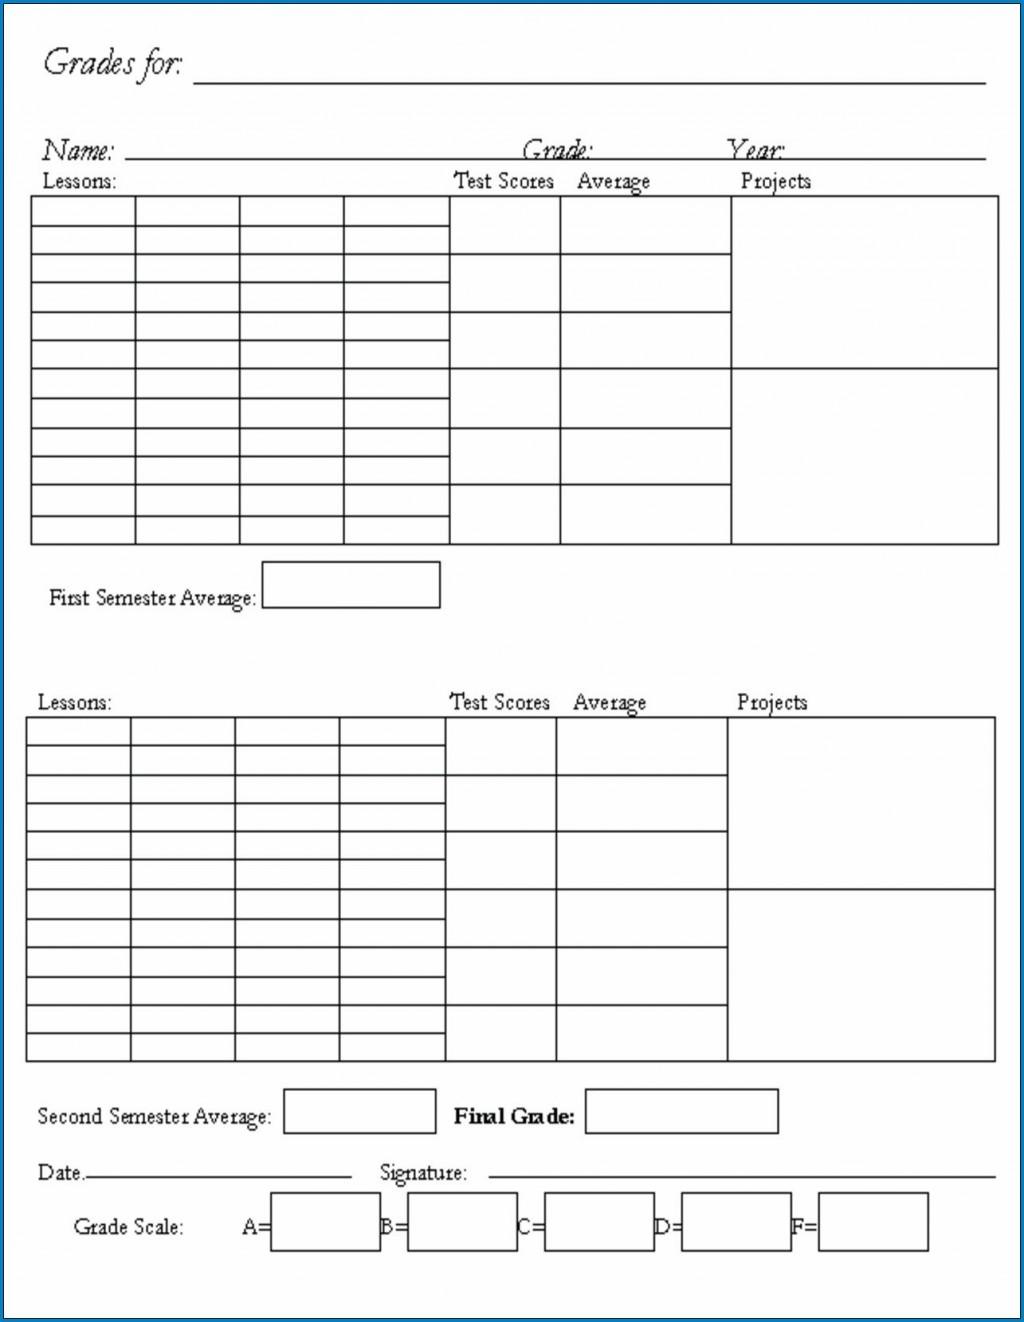 005 Singular Middle School Report Card Template Photo  Pdf Homeschool Free Standard Based SampleLarge